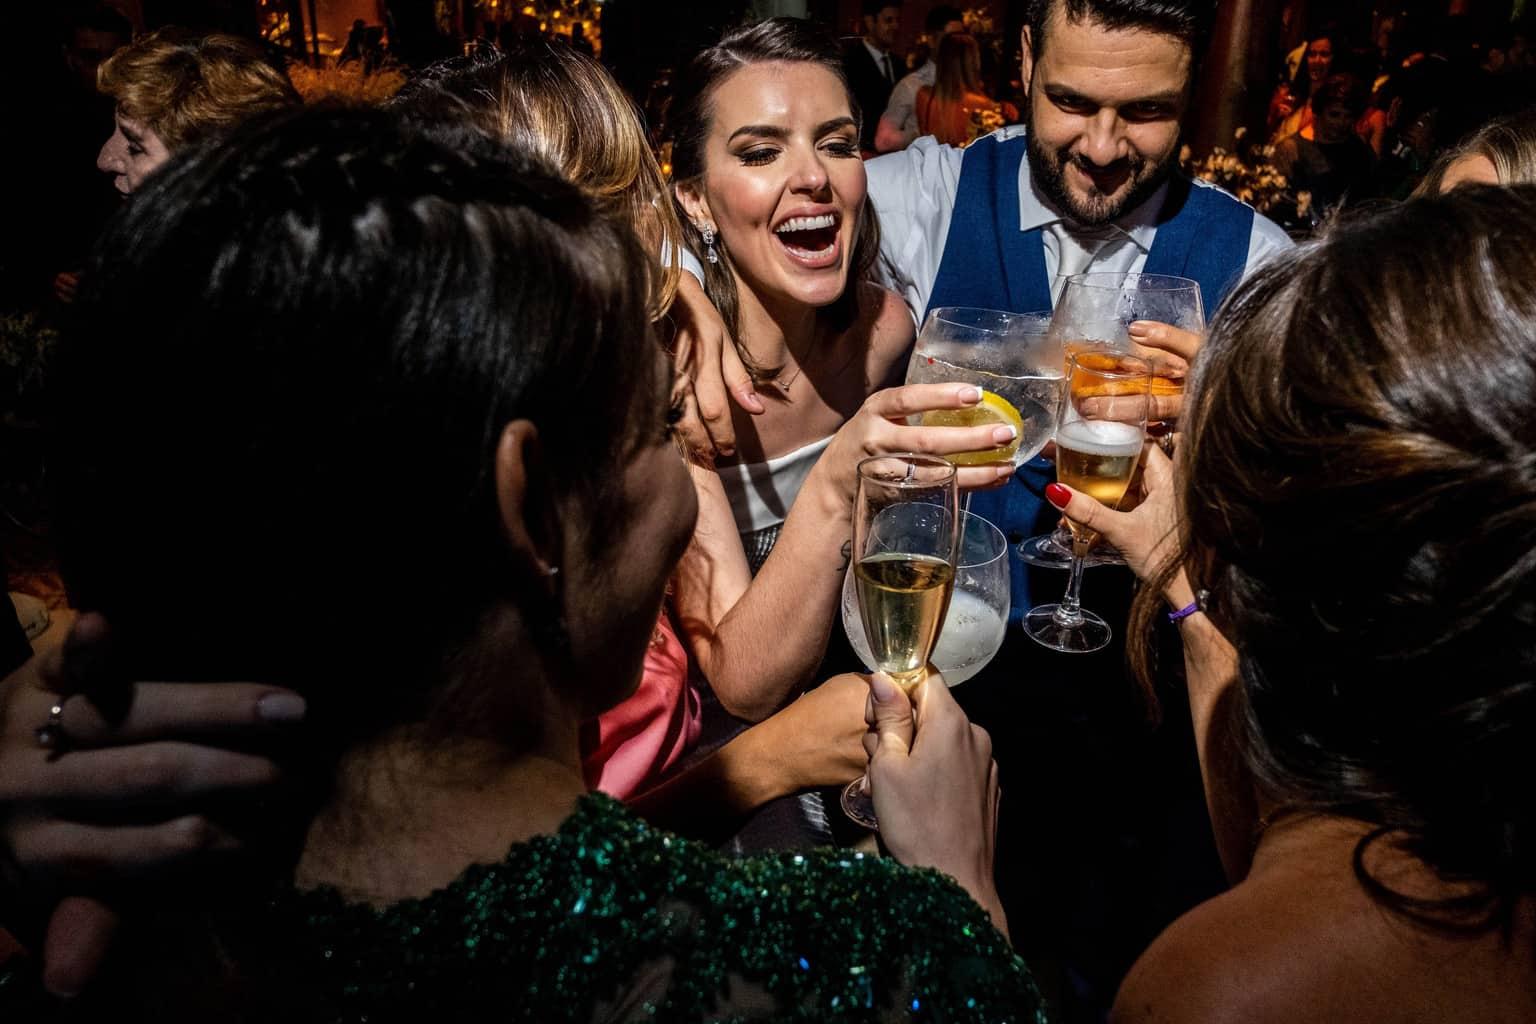 Bel-Benkler-eventos-Casamento-Ariane-e-Matheus-cerimonia-decoracao-contemporanea-fotografia-Rafael-Bigarelli-noivos-na-pista-Spazio-Giardini-22